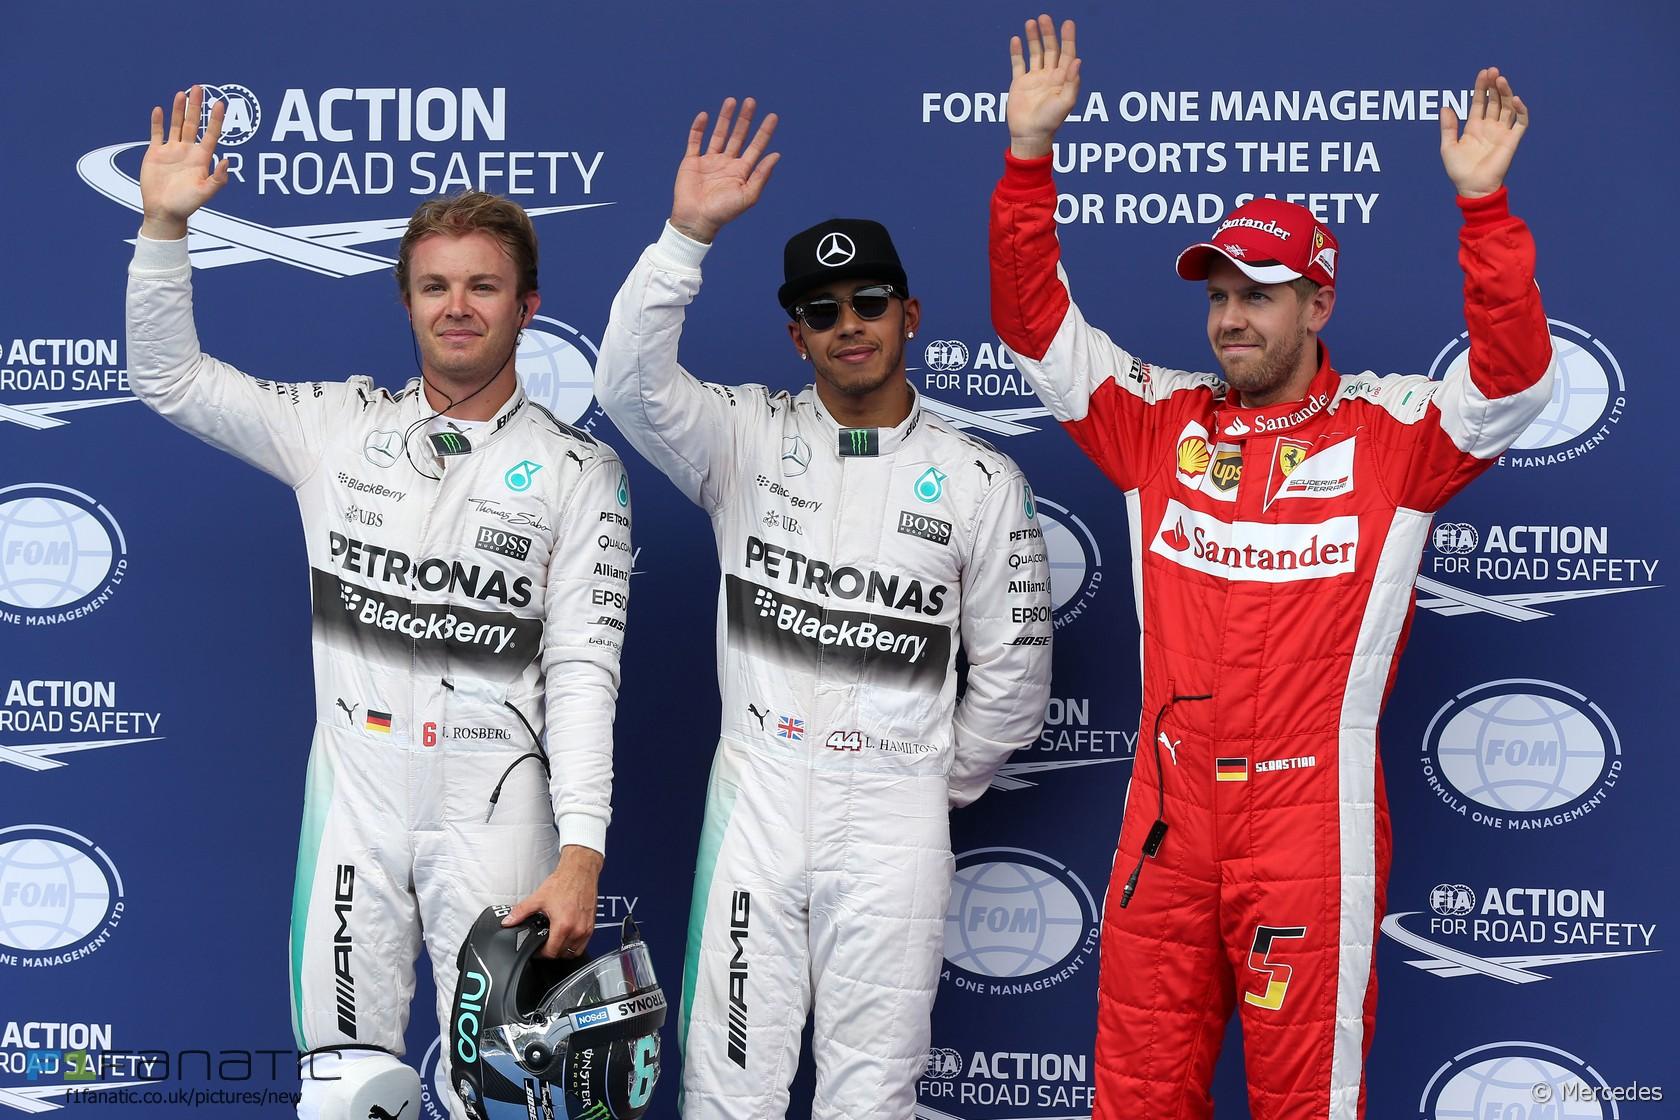 Nico Rosberg, Lewis Hamilton, Sebastian Vettel, Red Bull Ring, 2015